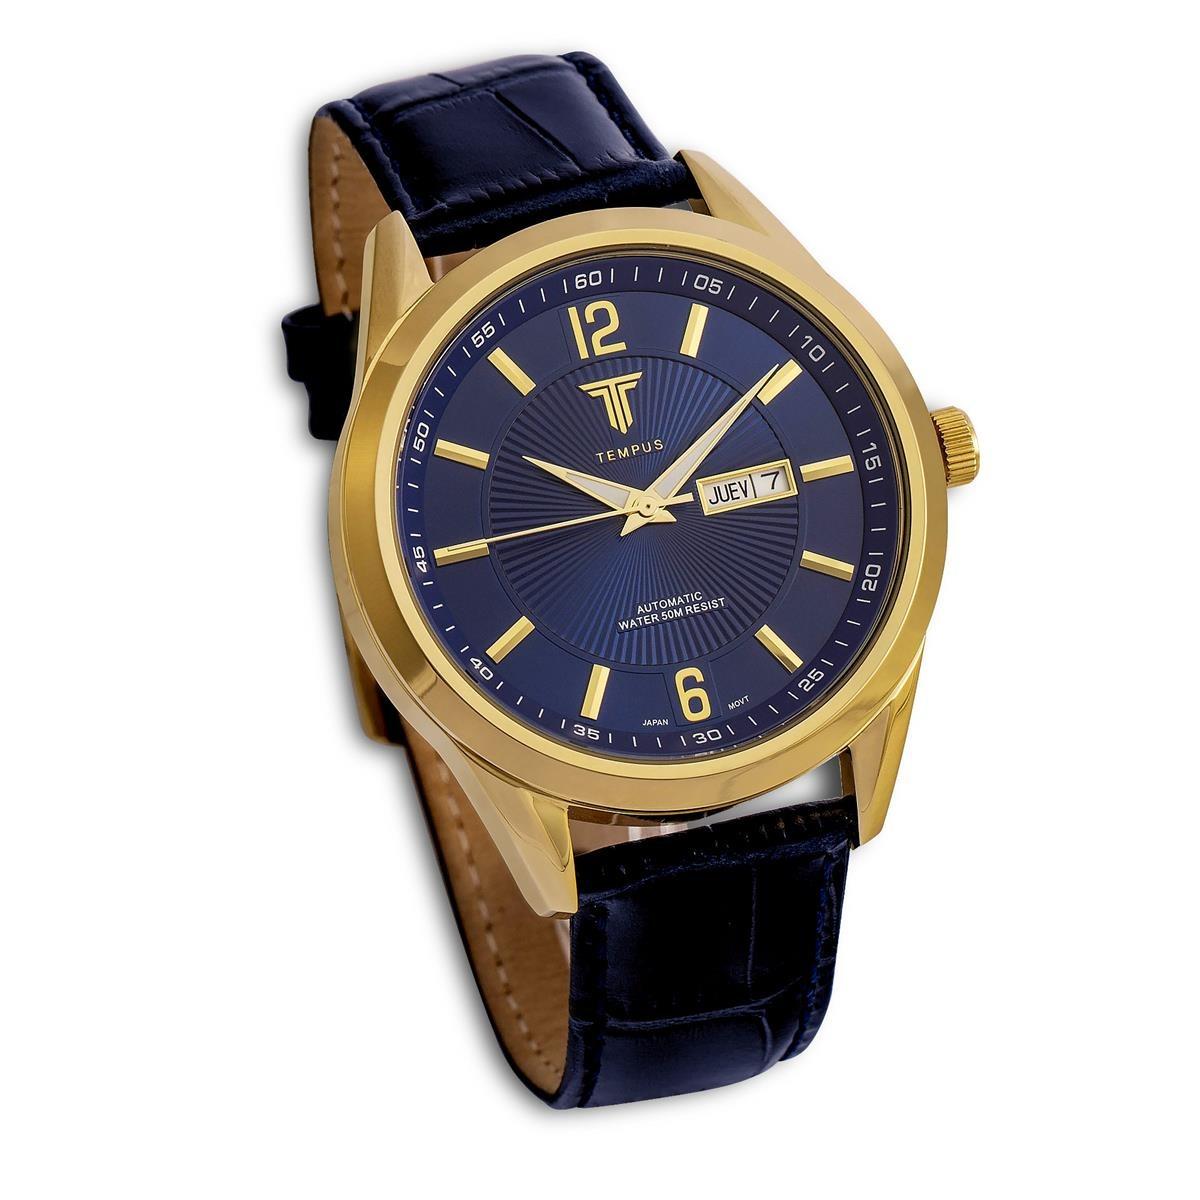 1abed4d80a9 relógio masculino tempus zw20136 gold black. Carregando zoom.